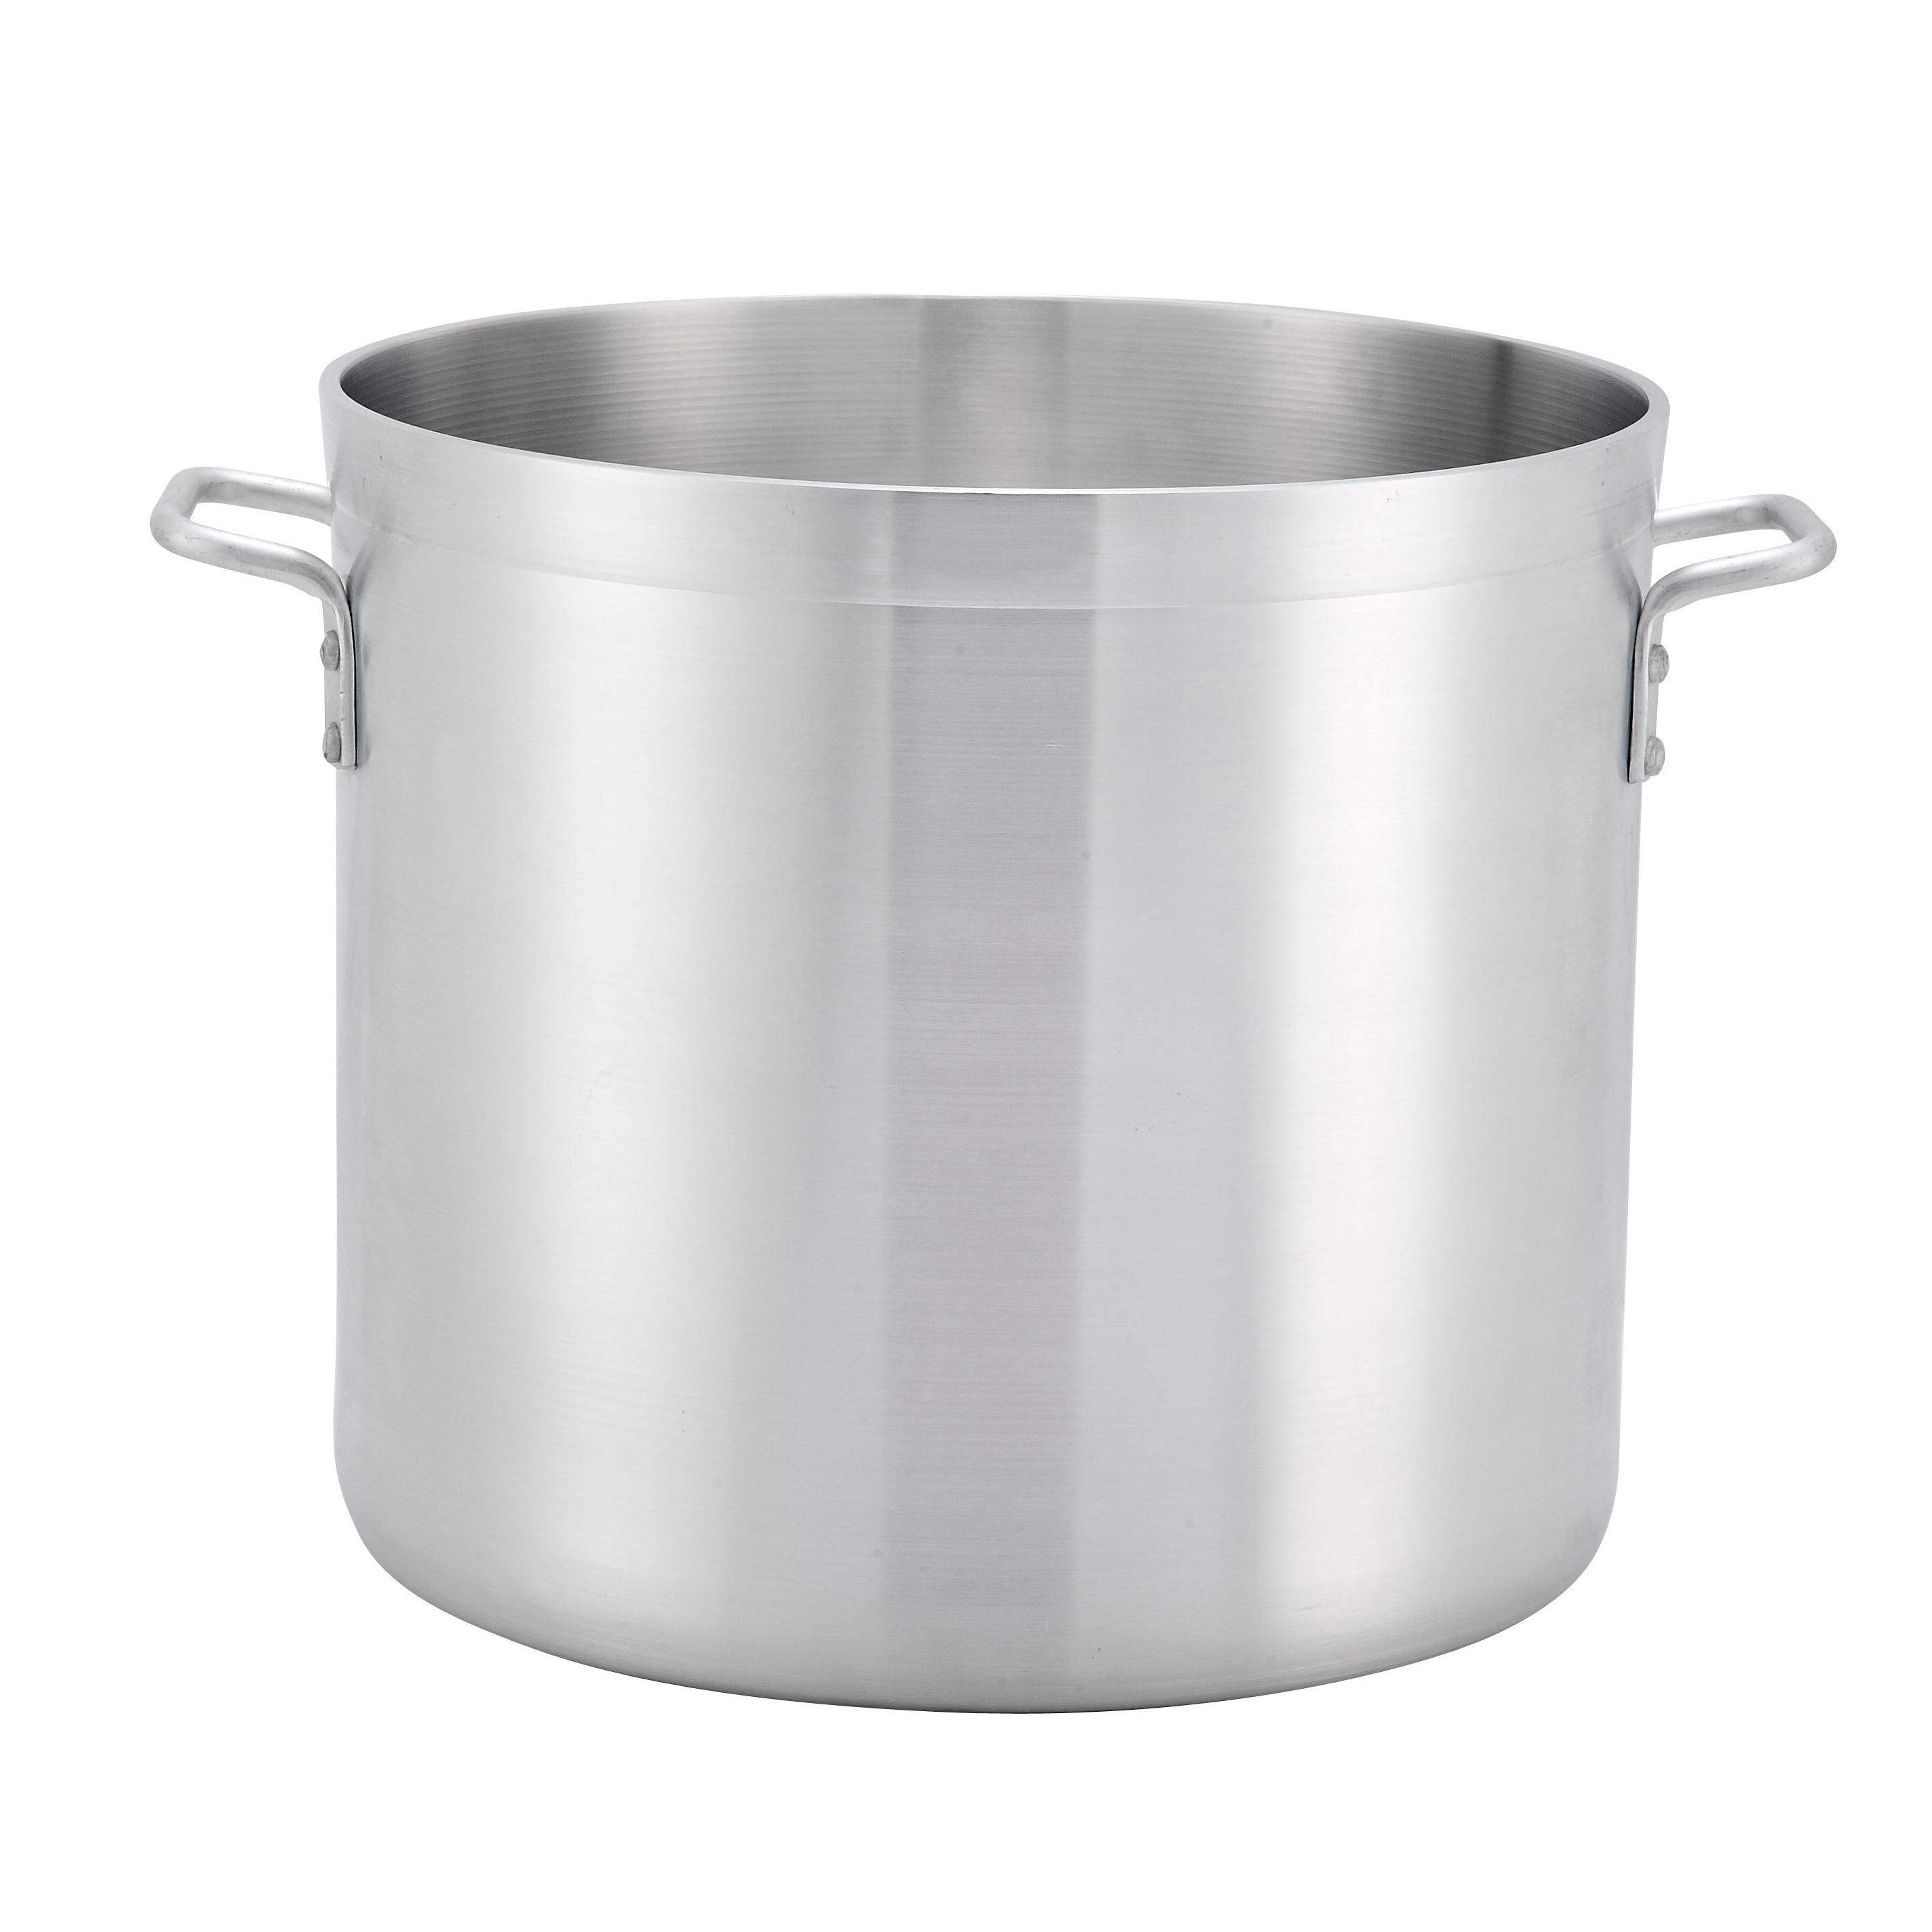 Winco ALHP-140 stock pot